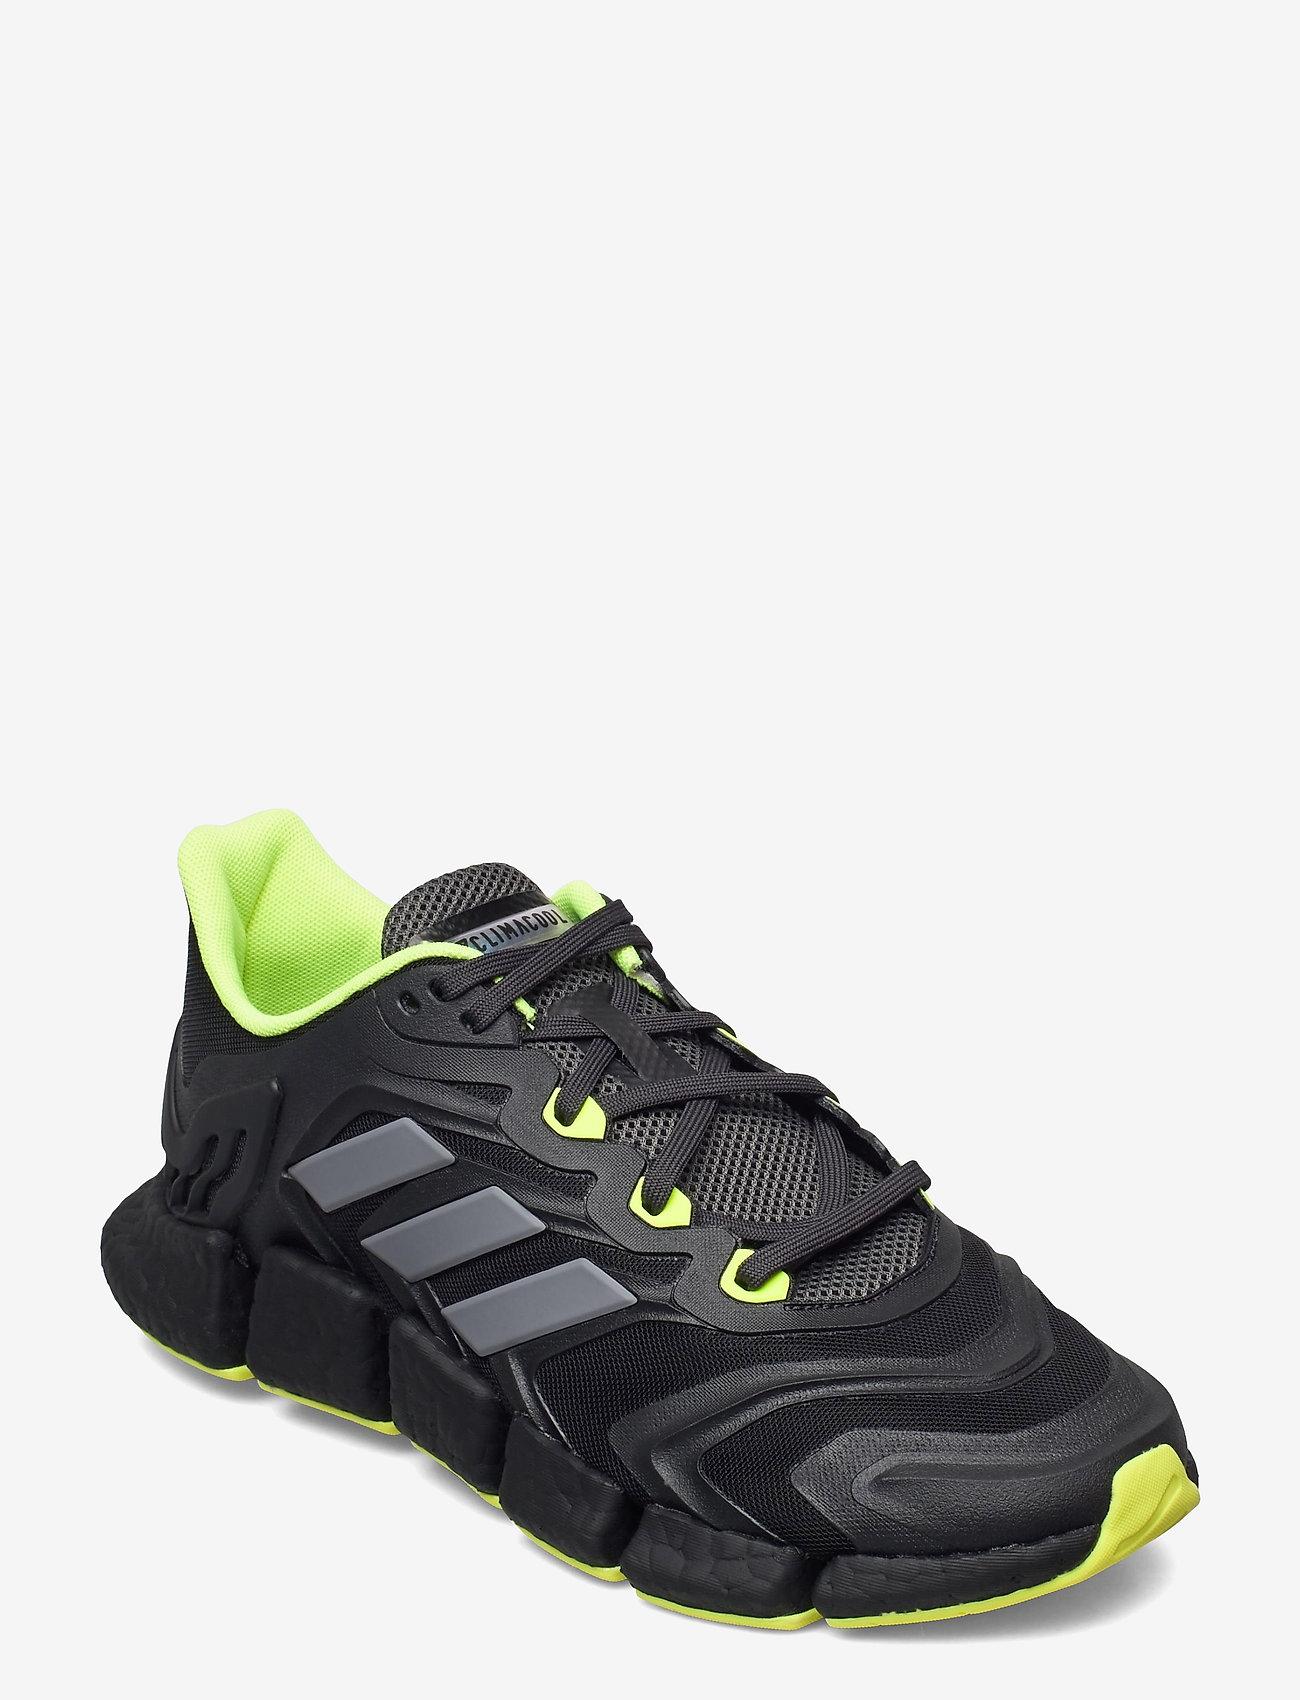 adidas Performance - CLIMACOOL VENTO - running shoes - cblack/grefou/carbon - 1